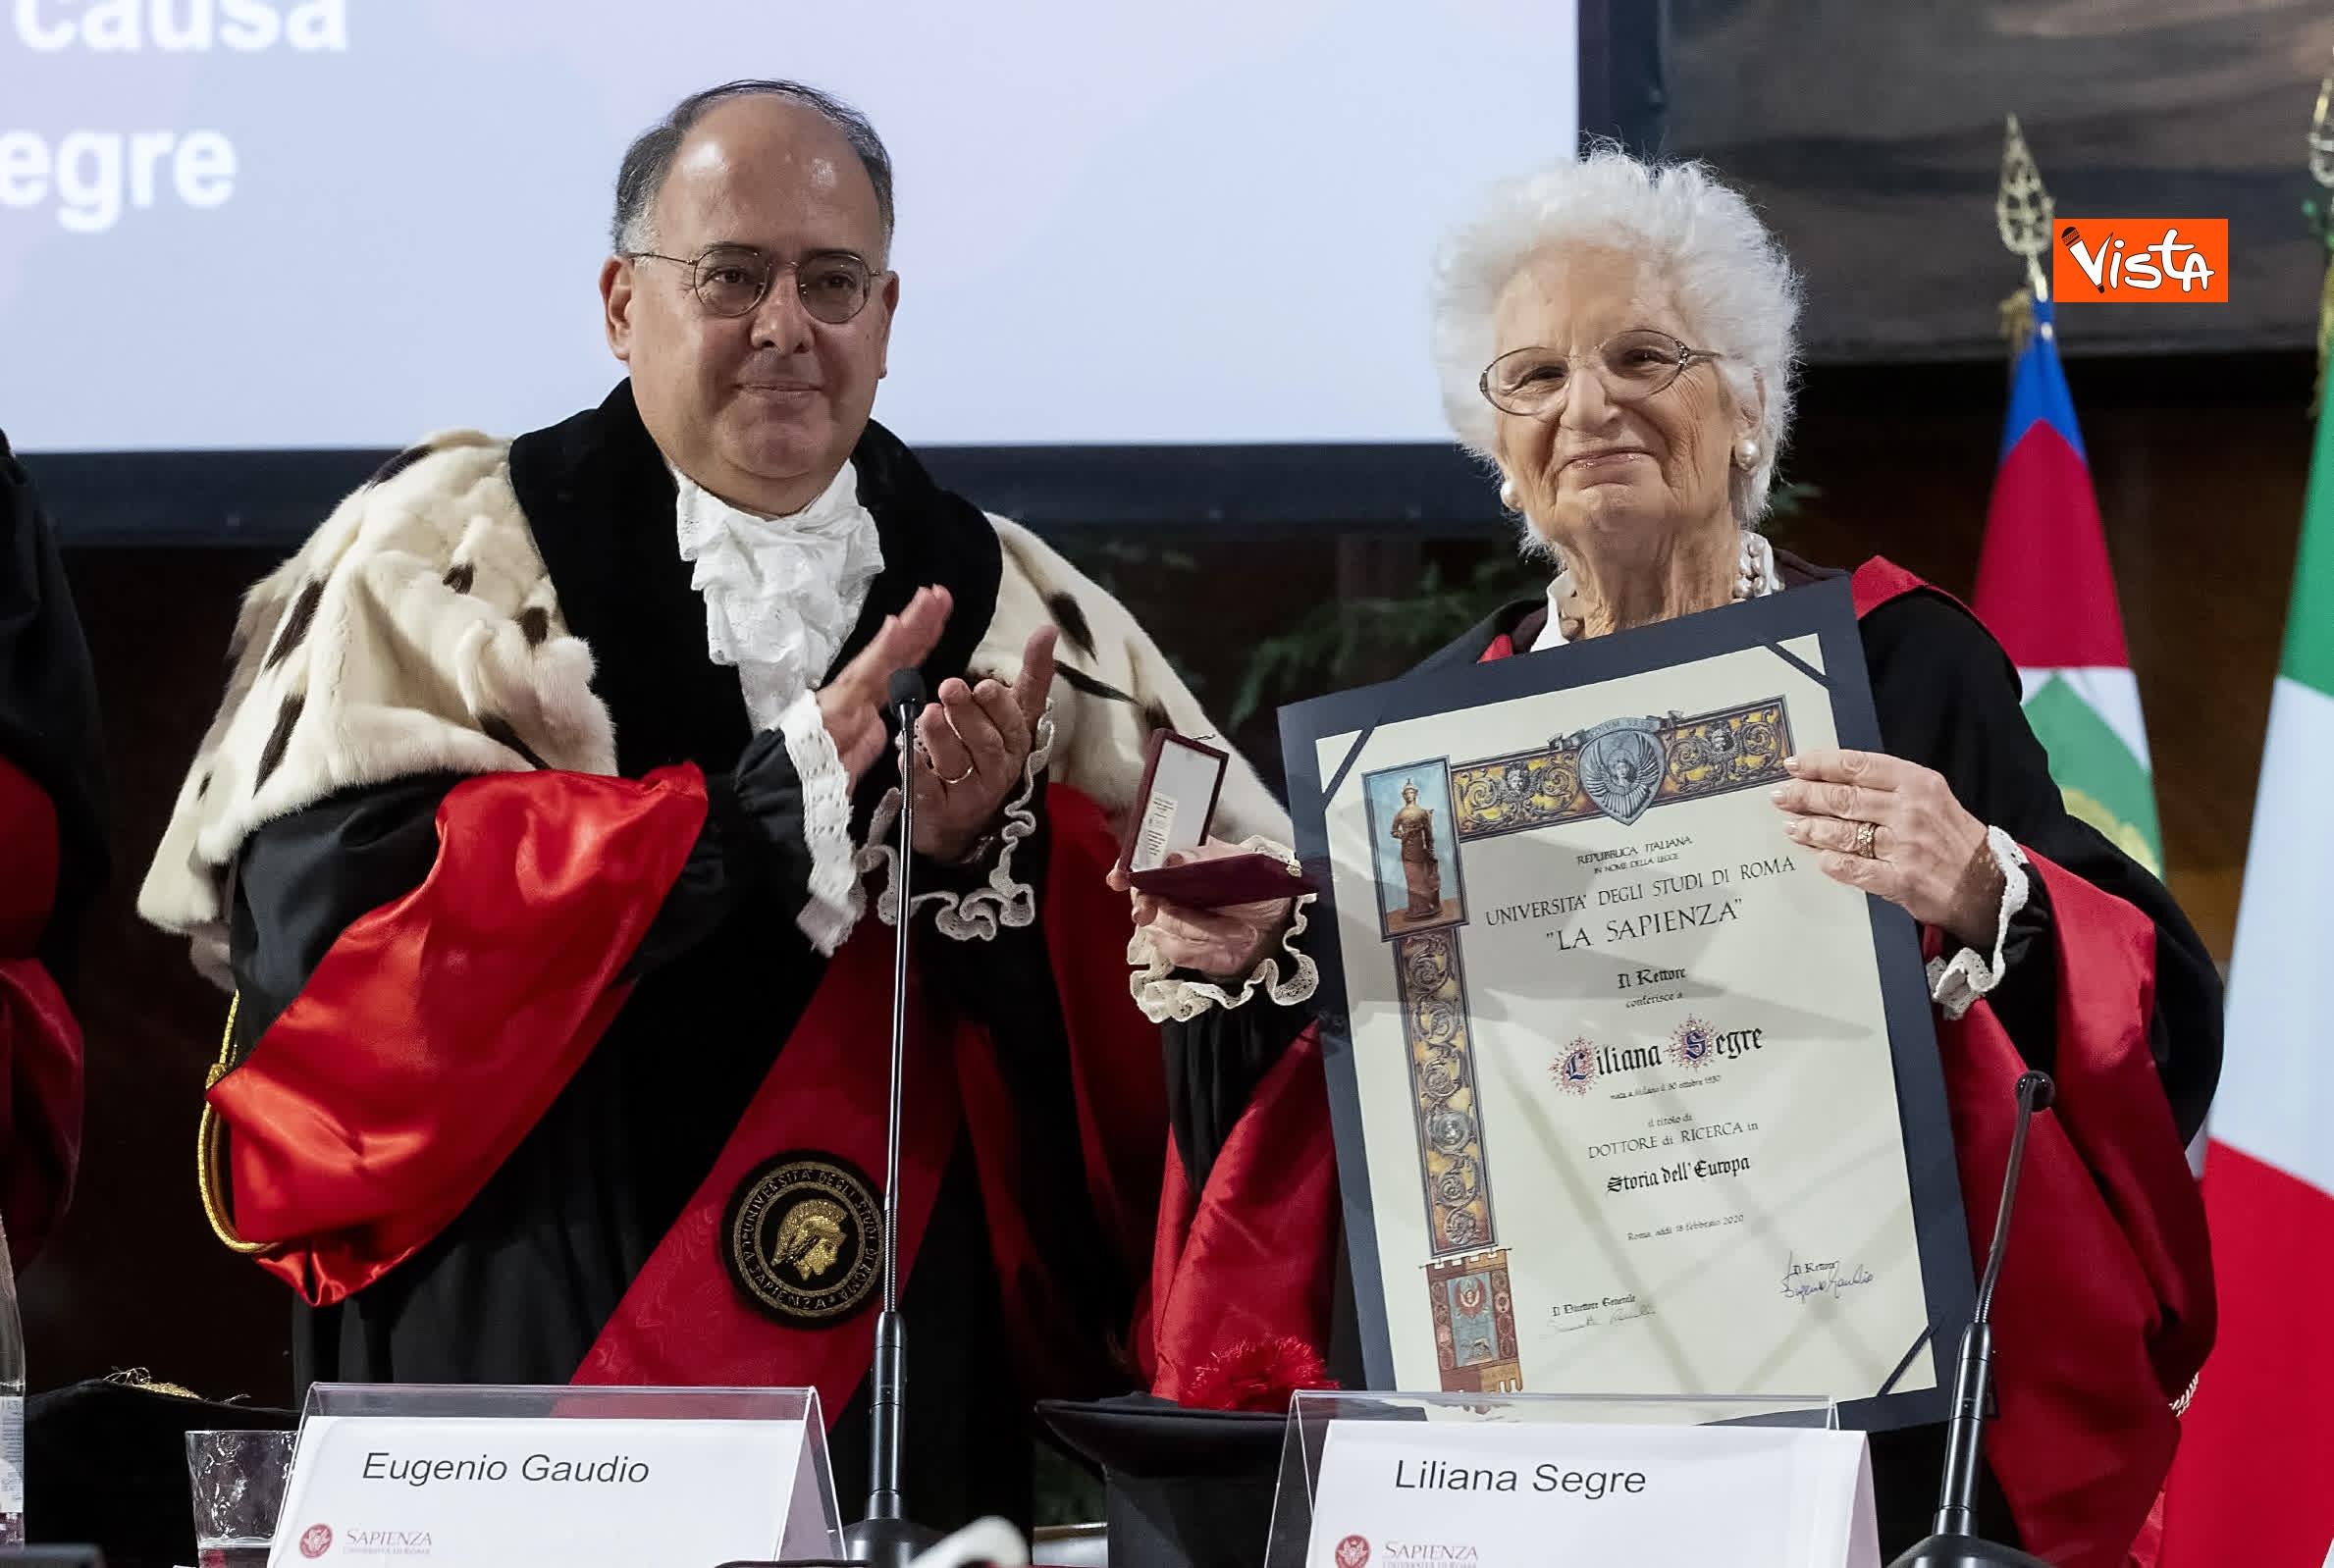 17-02-20 Segre riceve laurea honoris causa dal rettore della Sapienza Gaudio_06